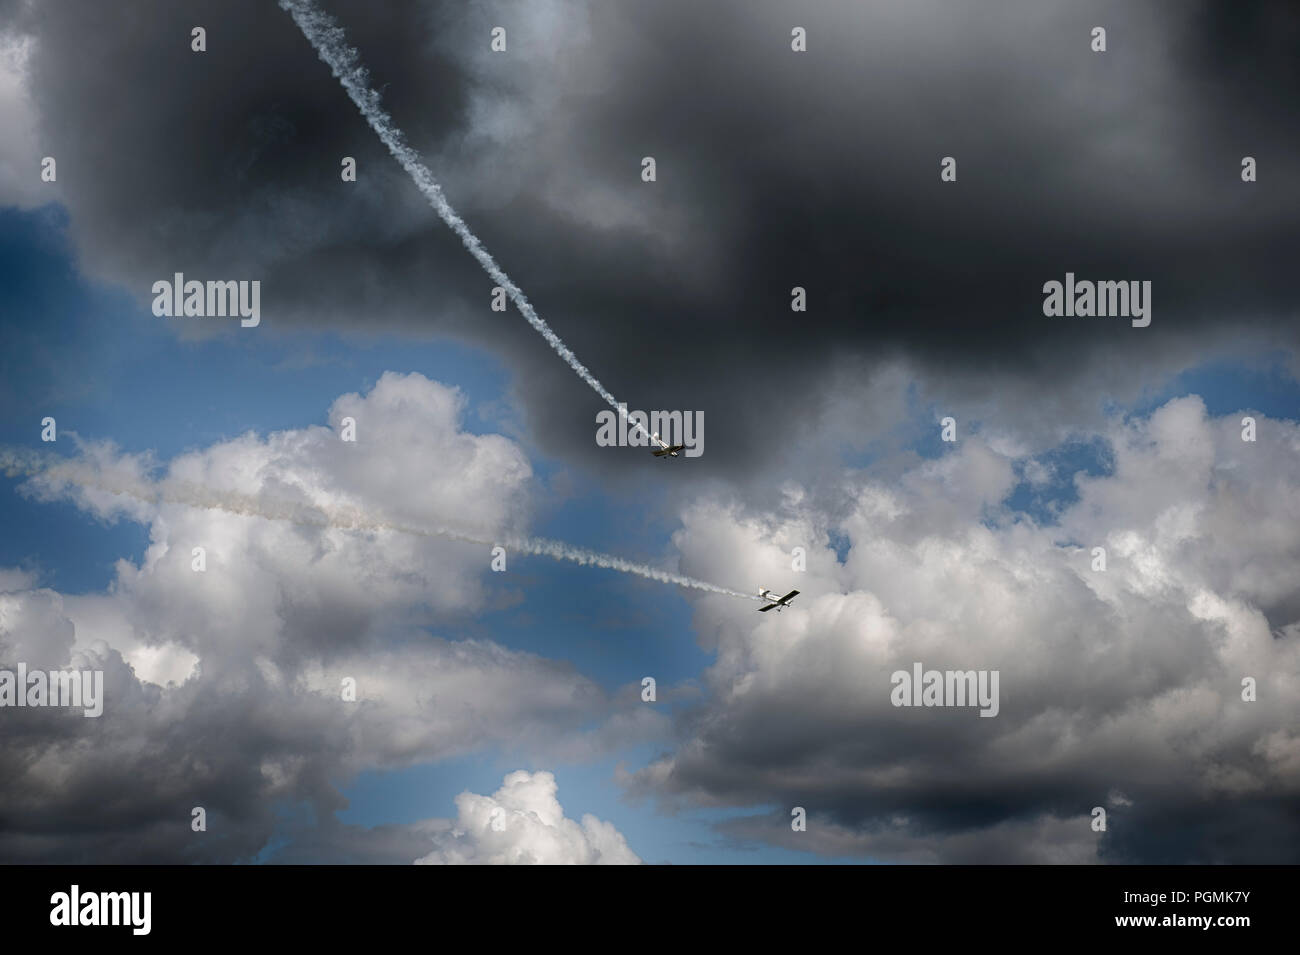 Surrey, UK. Fireflies Aerobatics Display Team flying display at 2018 Dunsfold Wings and Wheels. Credit: Malcolm Park/Alamy. - Stock Image